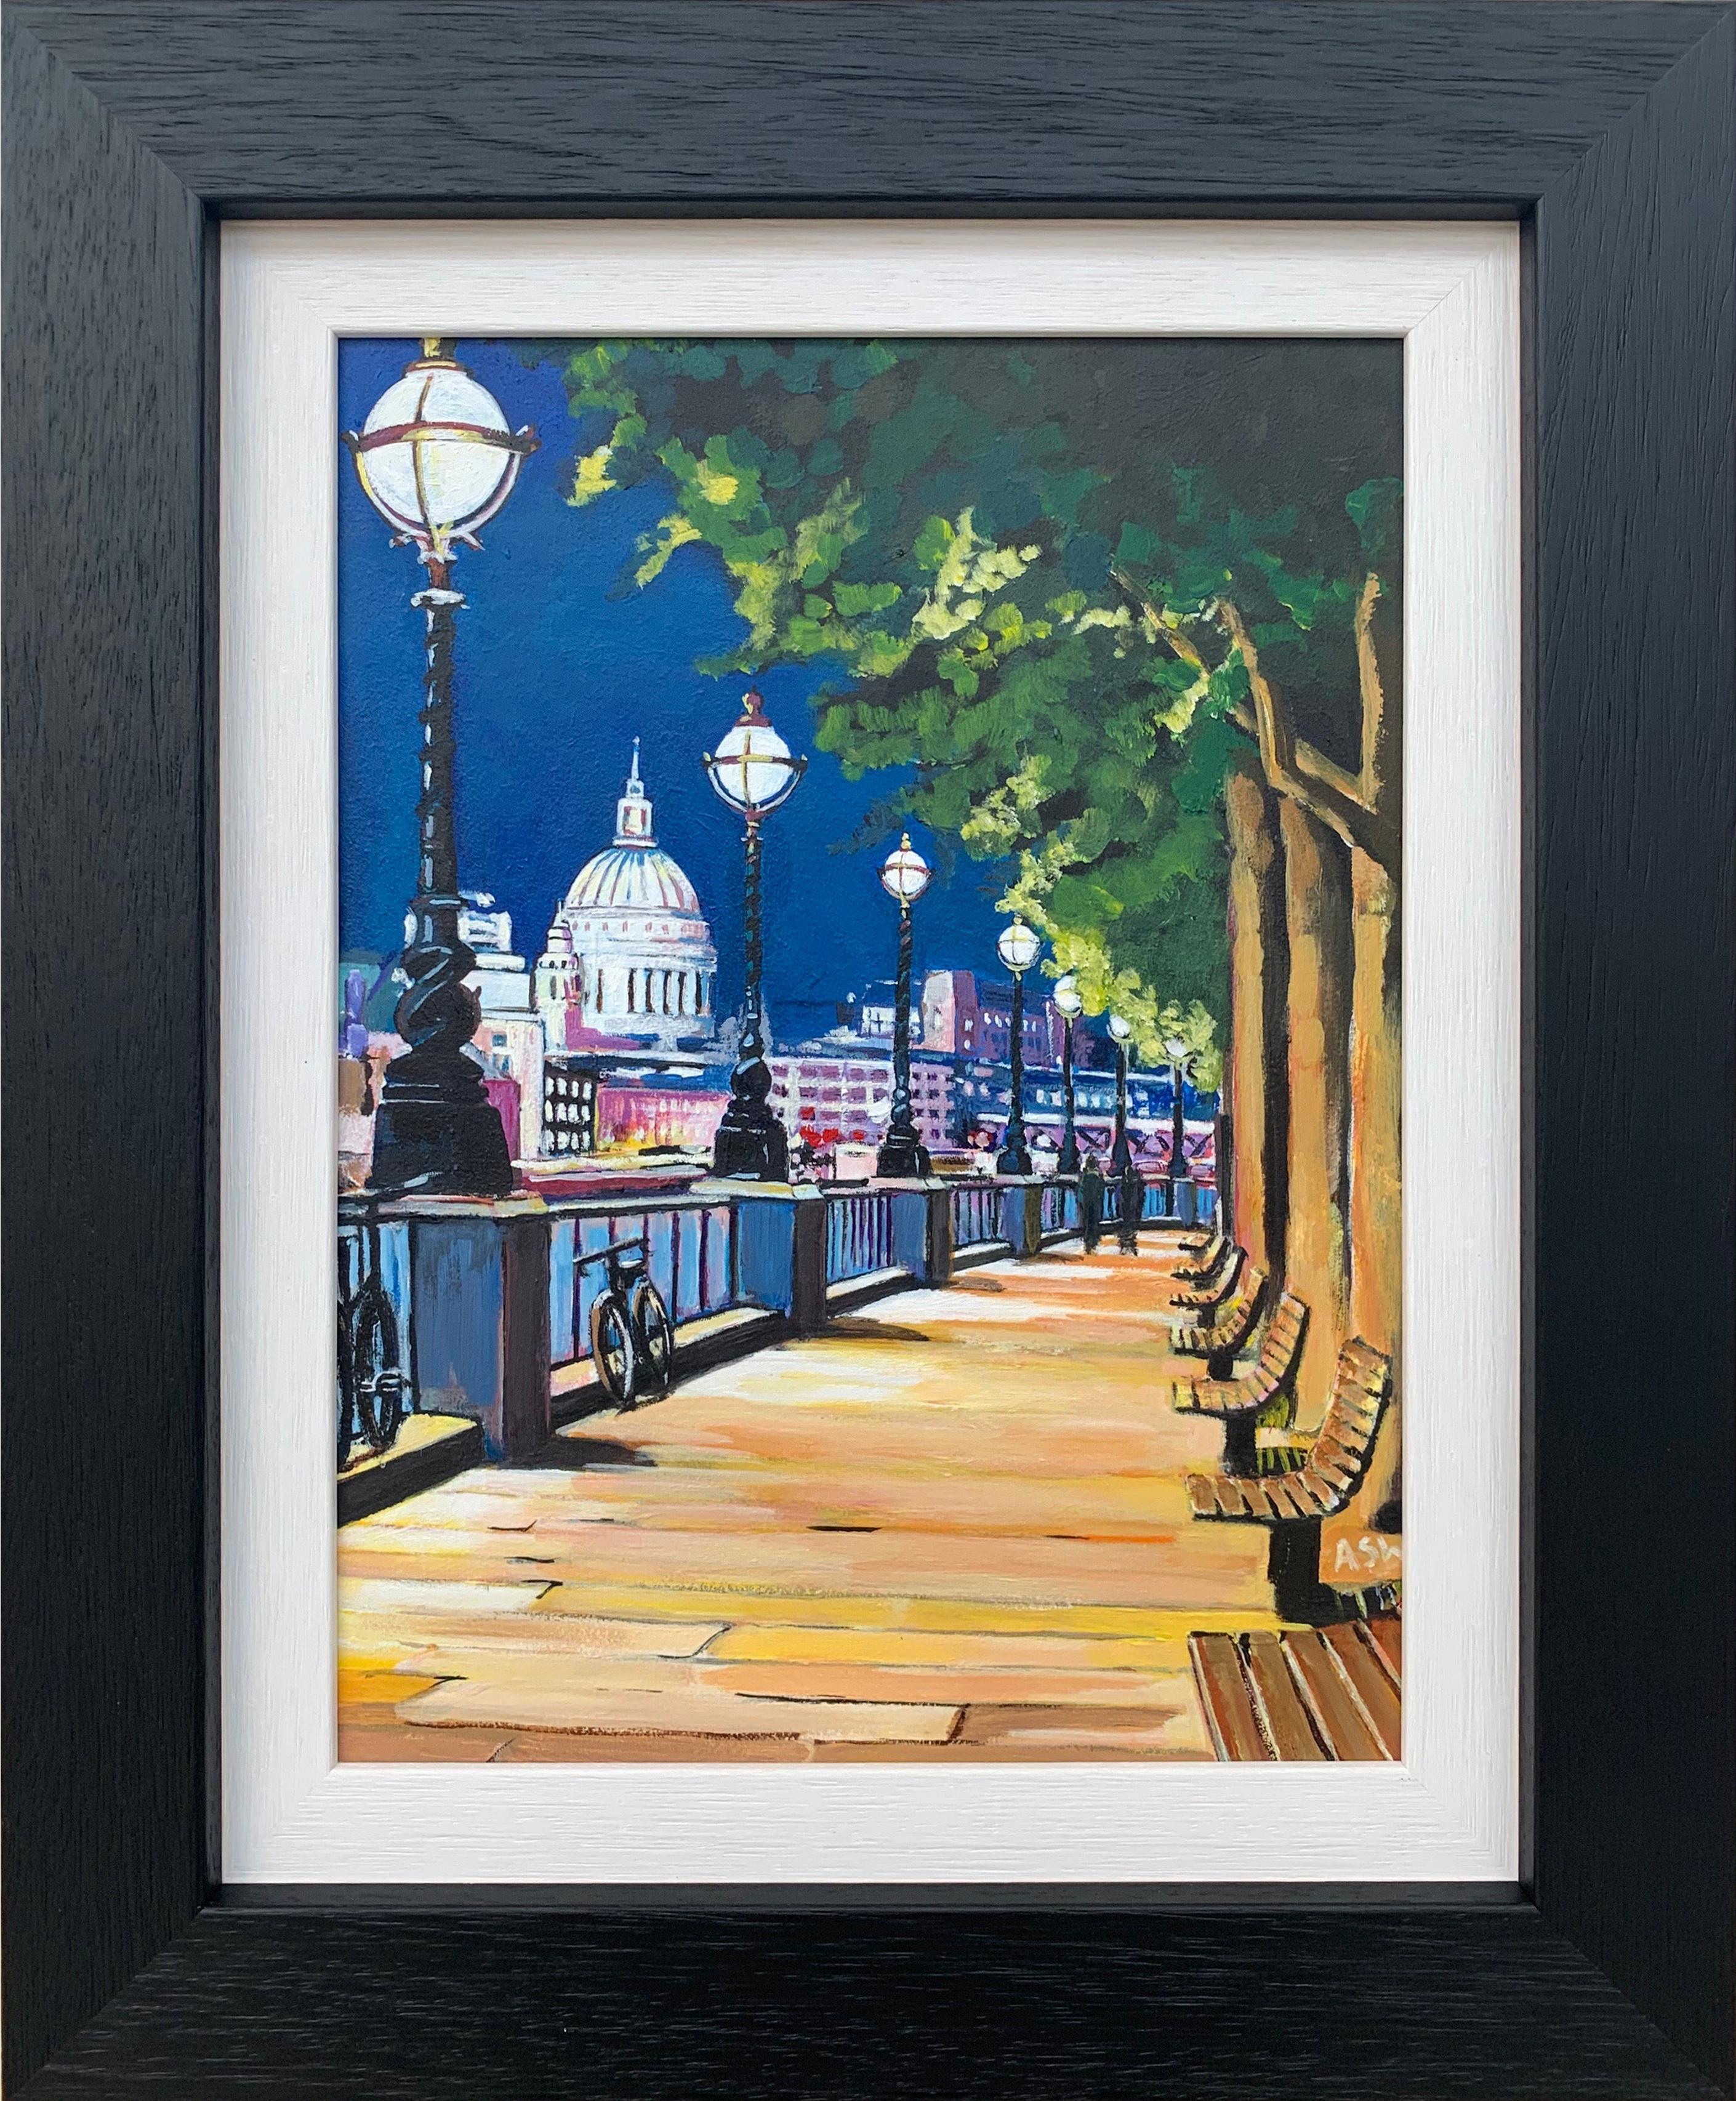 Painting of Victoria Embankment & St Paul's London City by British Urban Artist